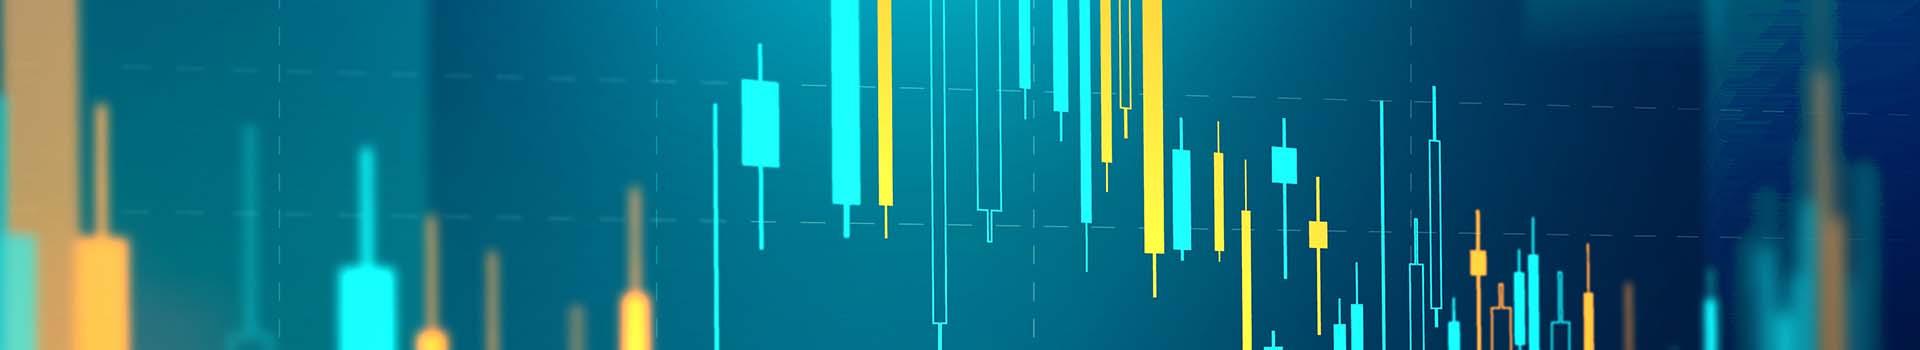 Stock market chart technology vector blue background